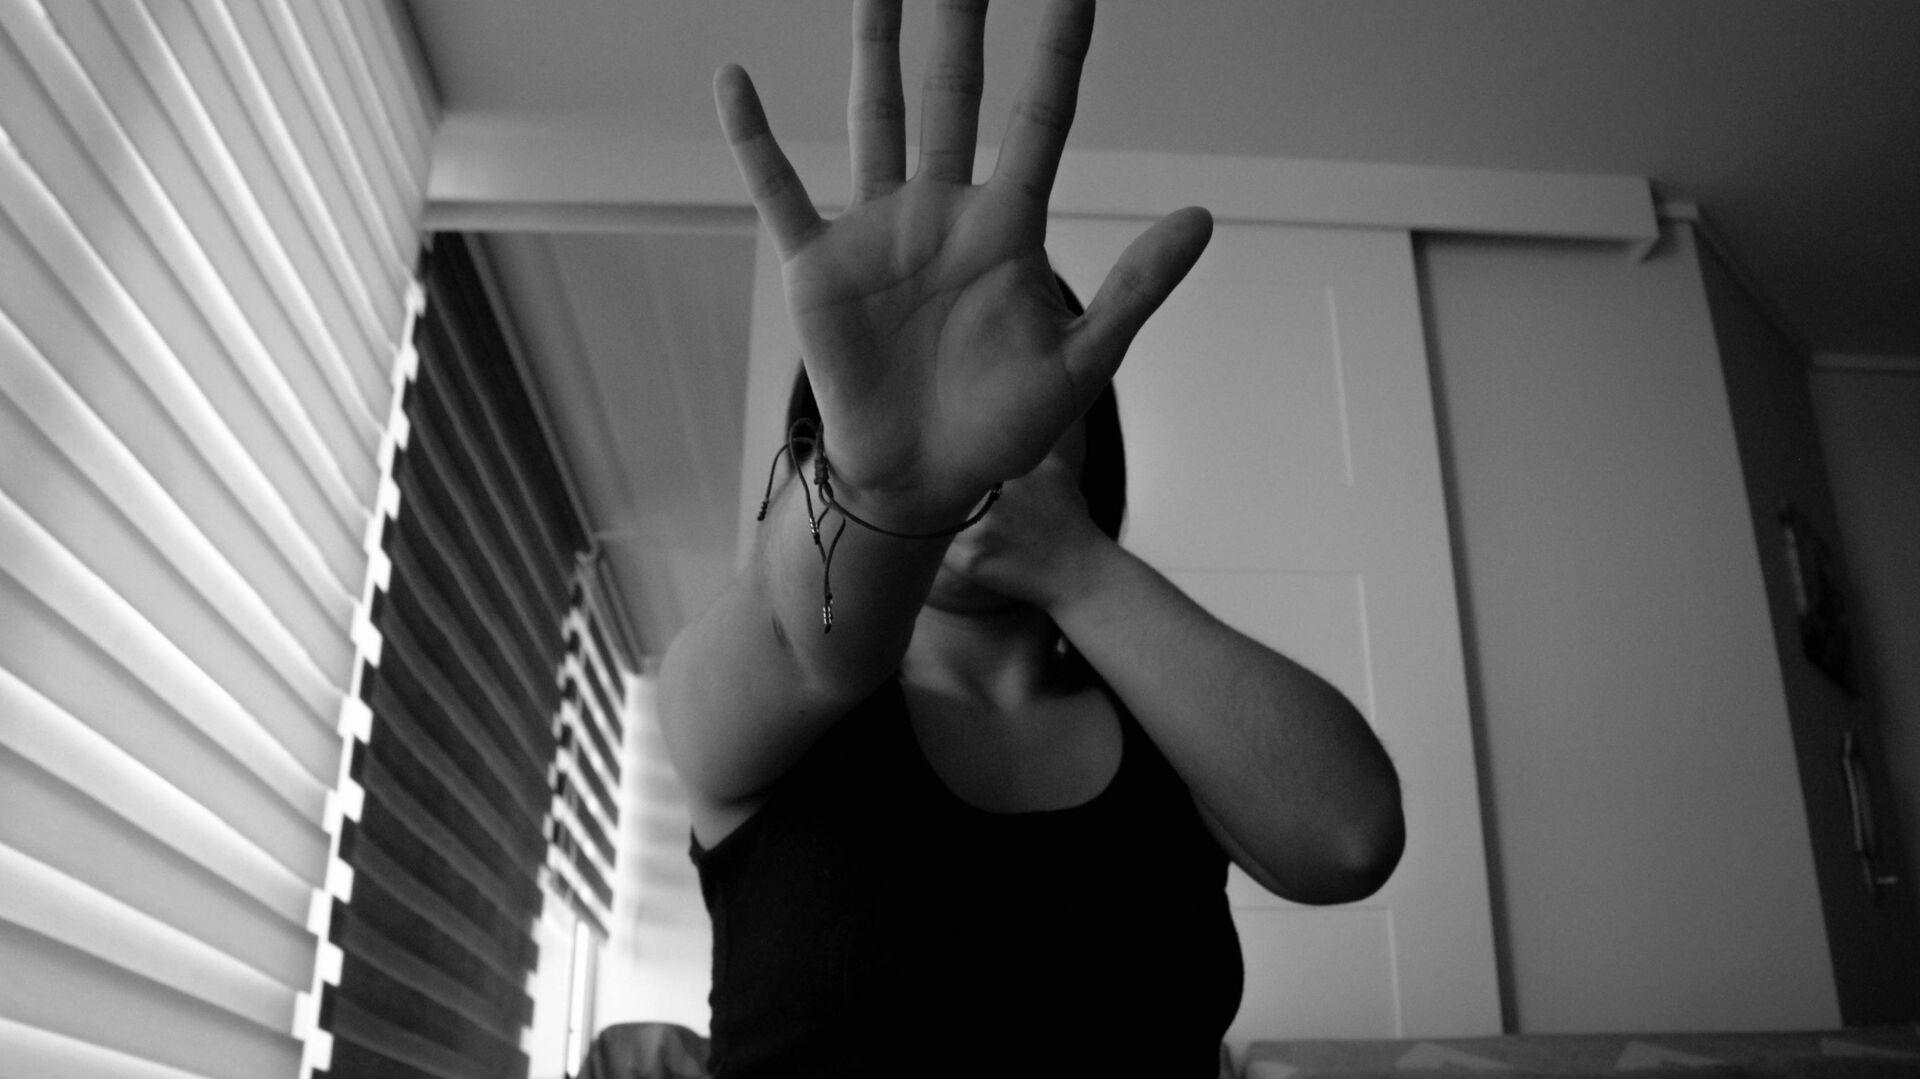 ¿Qué pasa después de una denuncia por violencia doméstica? - Sputnik Mundo, 1920, 12.02.2021